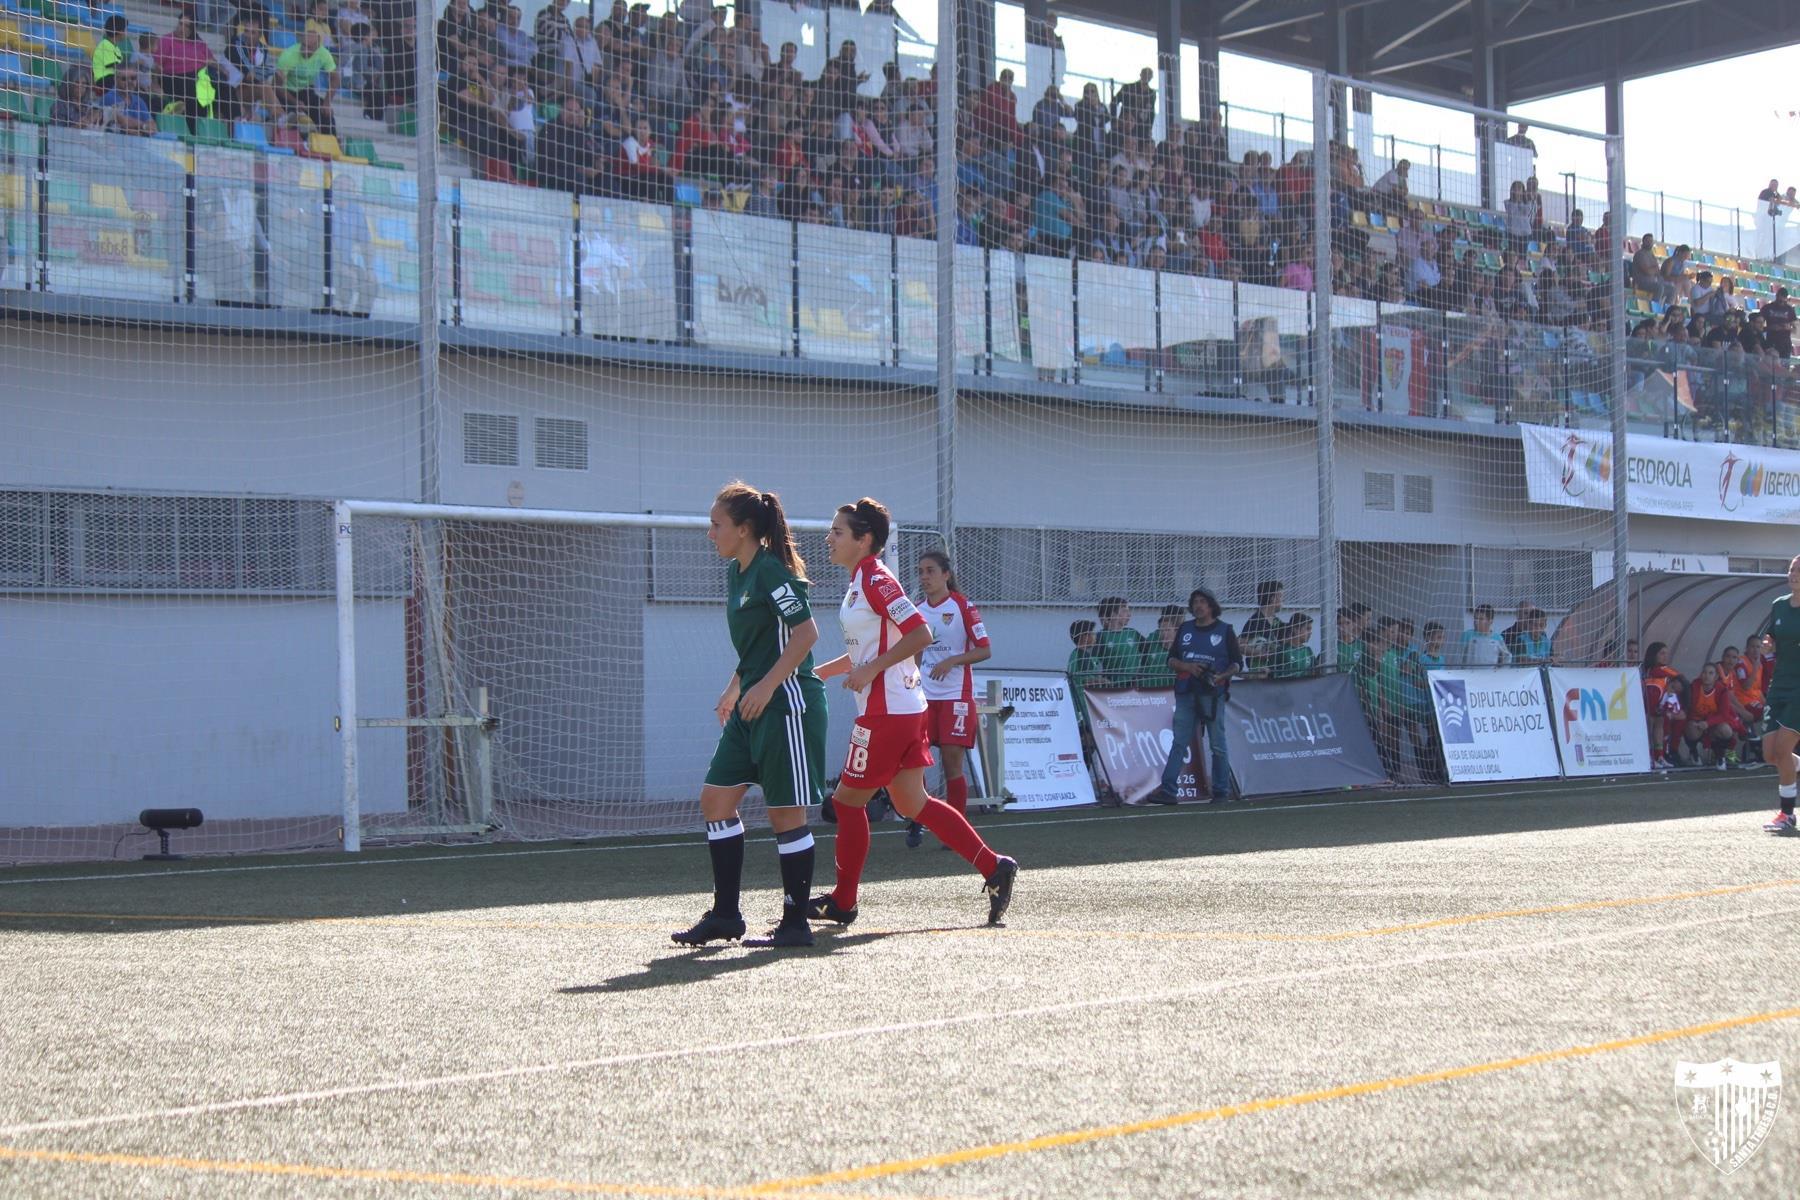 Santa Teresa Badajoz y RCD Espanyol se citan en las IDM El Vivero (3)